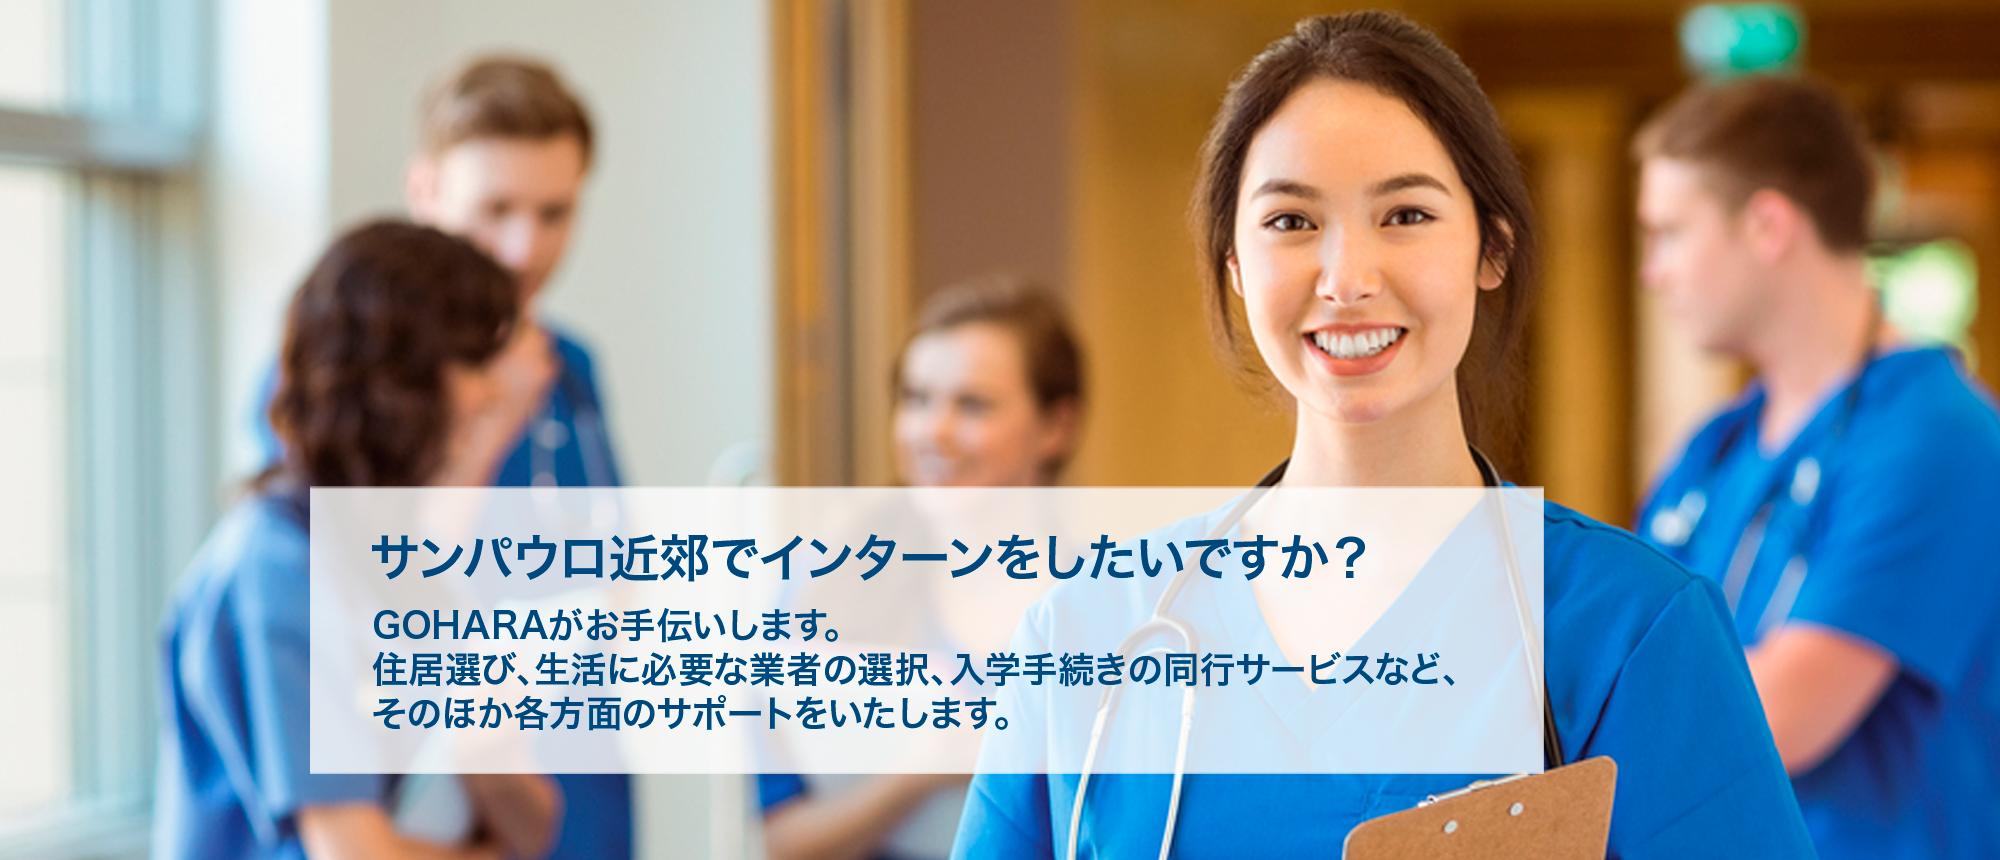 gohara-banner4-JP